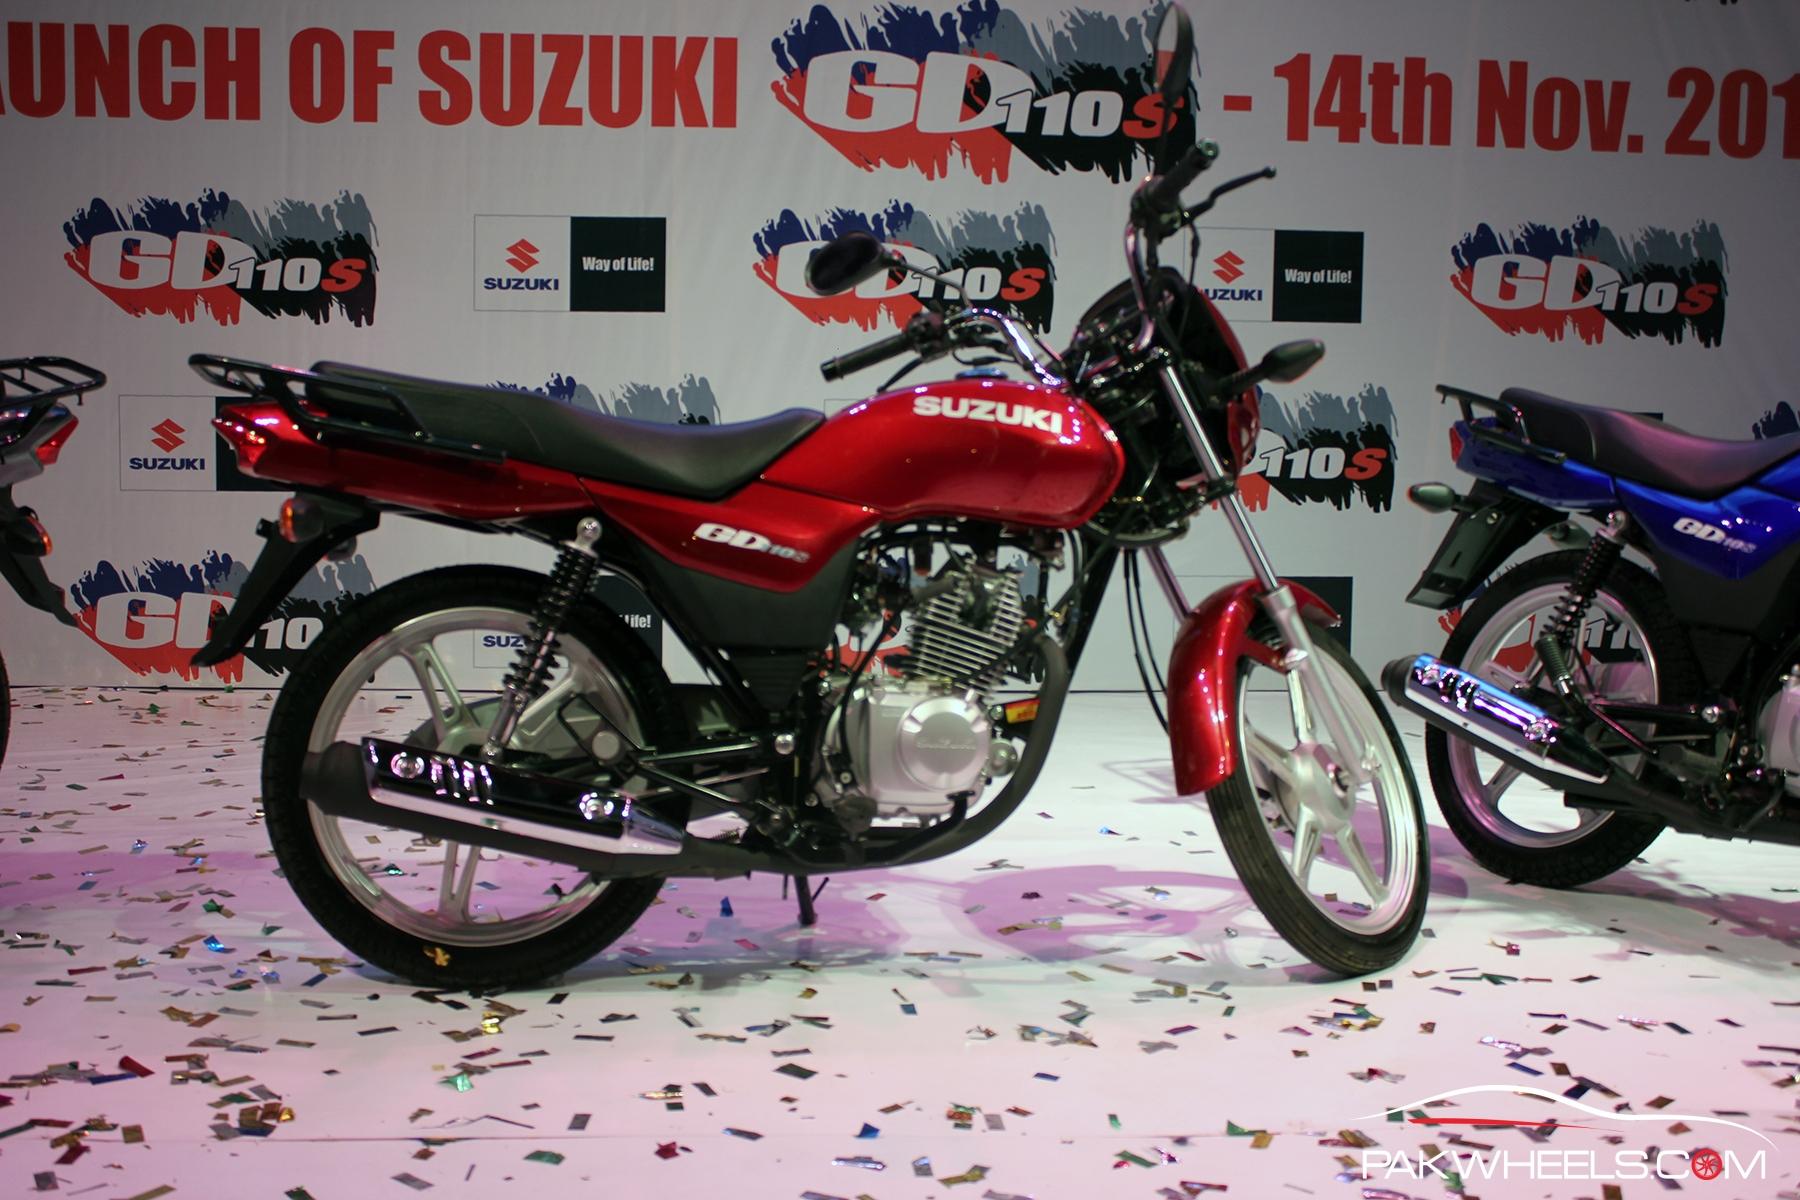 Honda Parts Cheap >> Pak Suzuki launches the upgraded Suzuki GD110S - PakWheels Blog